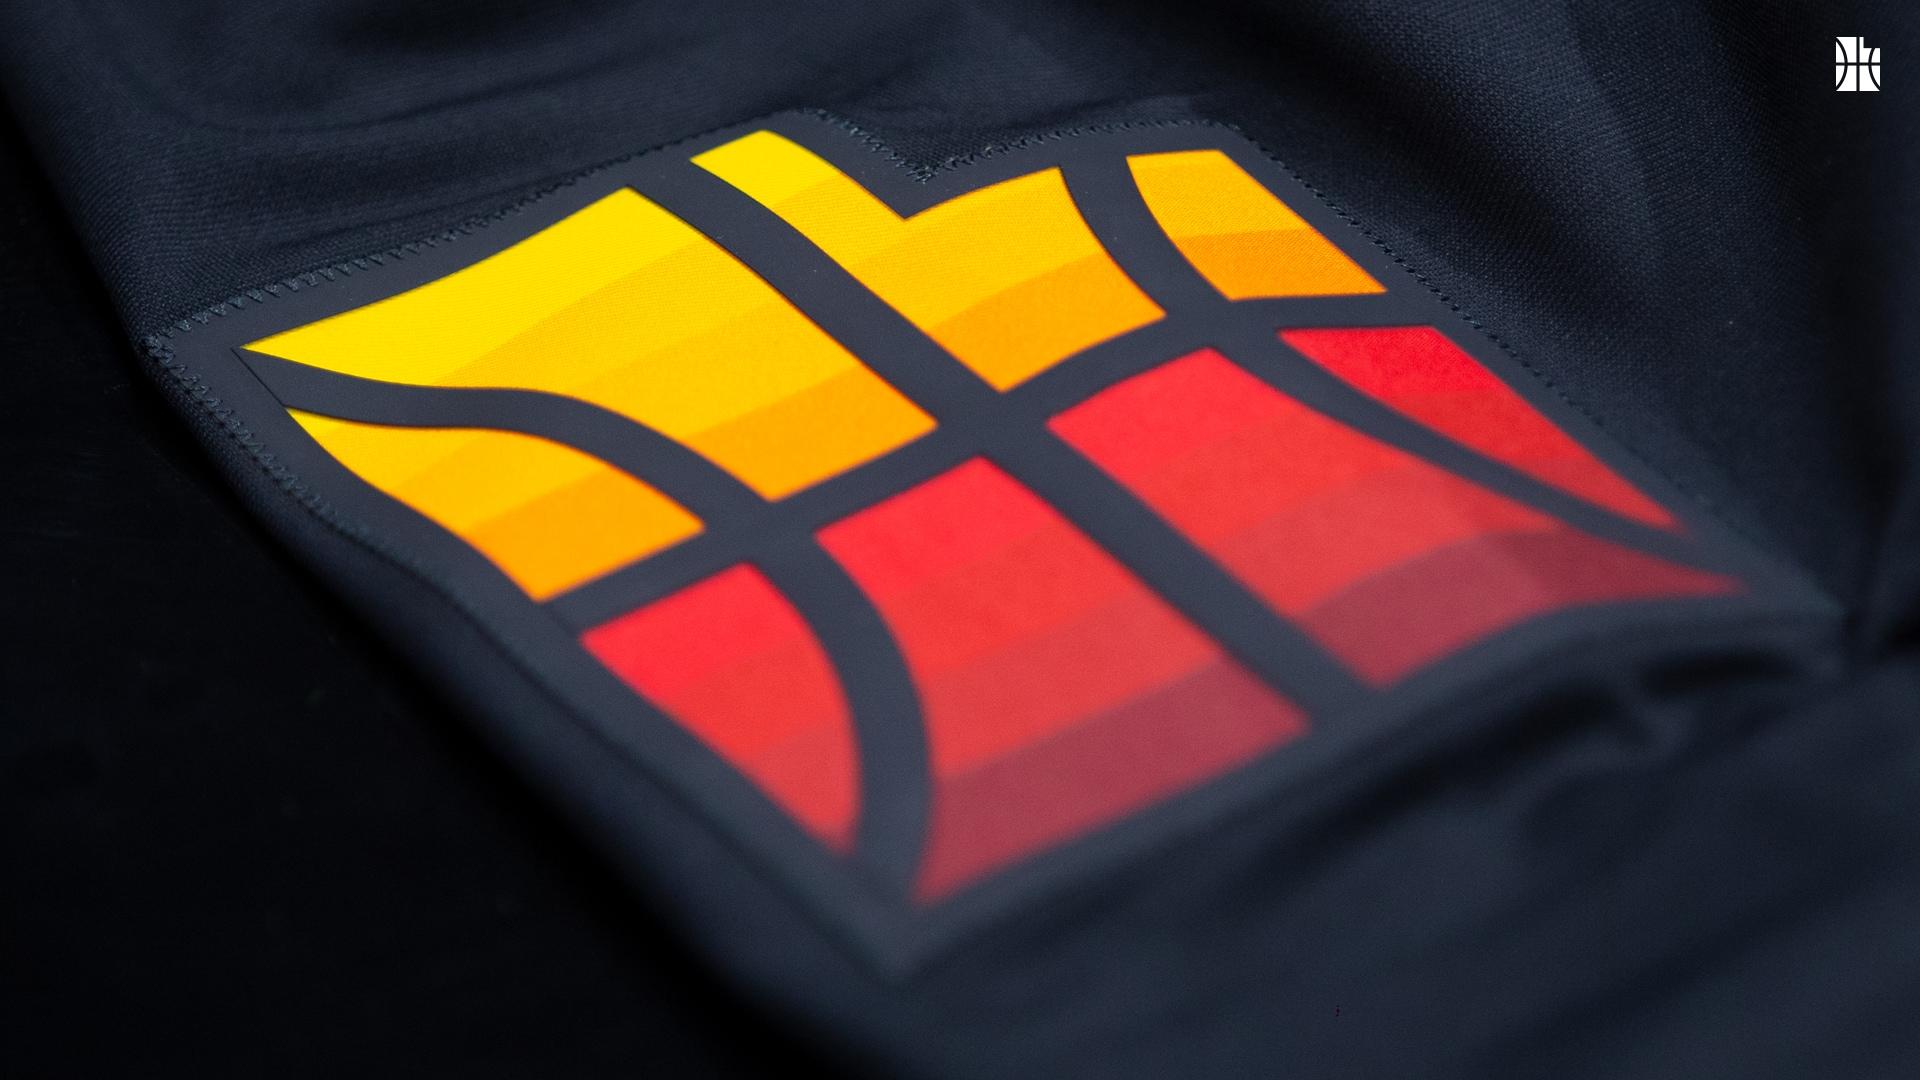 Jazz update City Edition uniforms for 2020-21 season